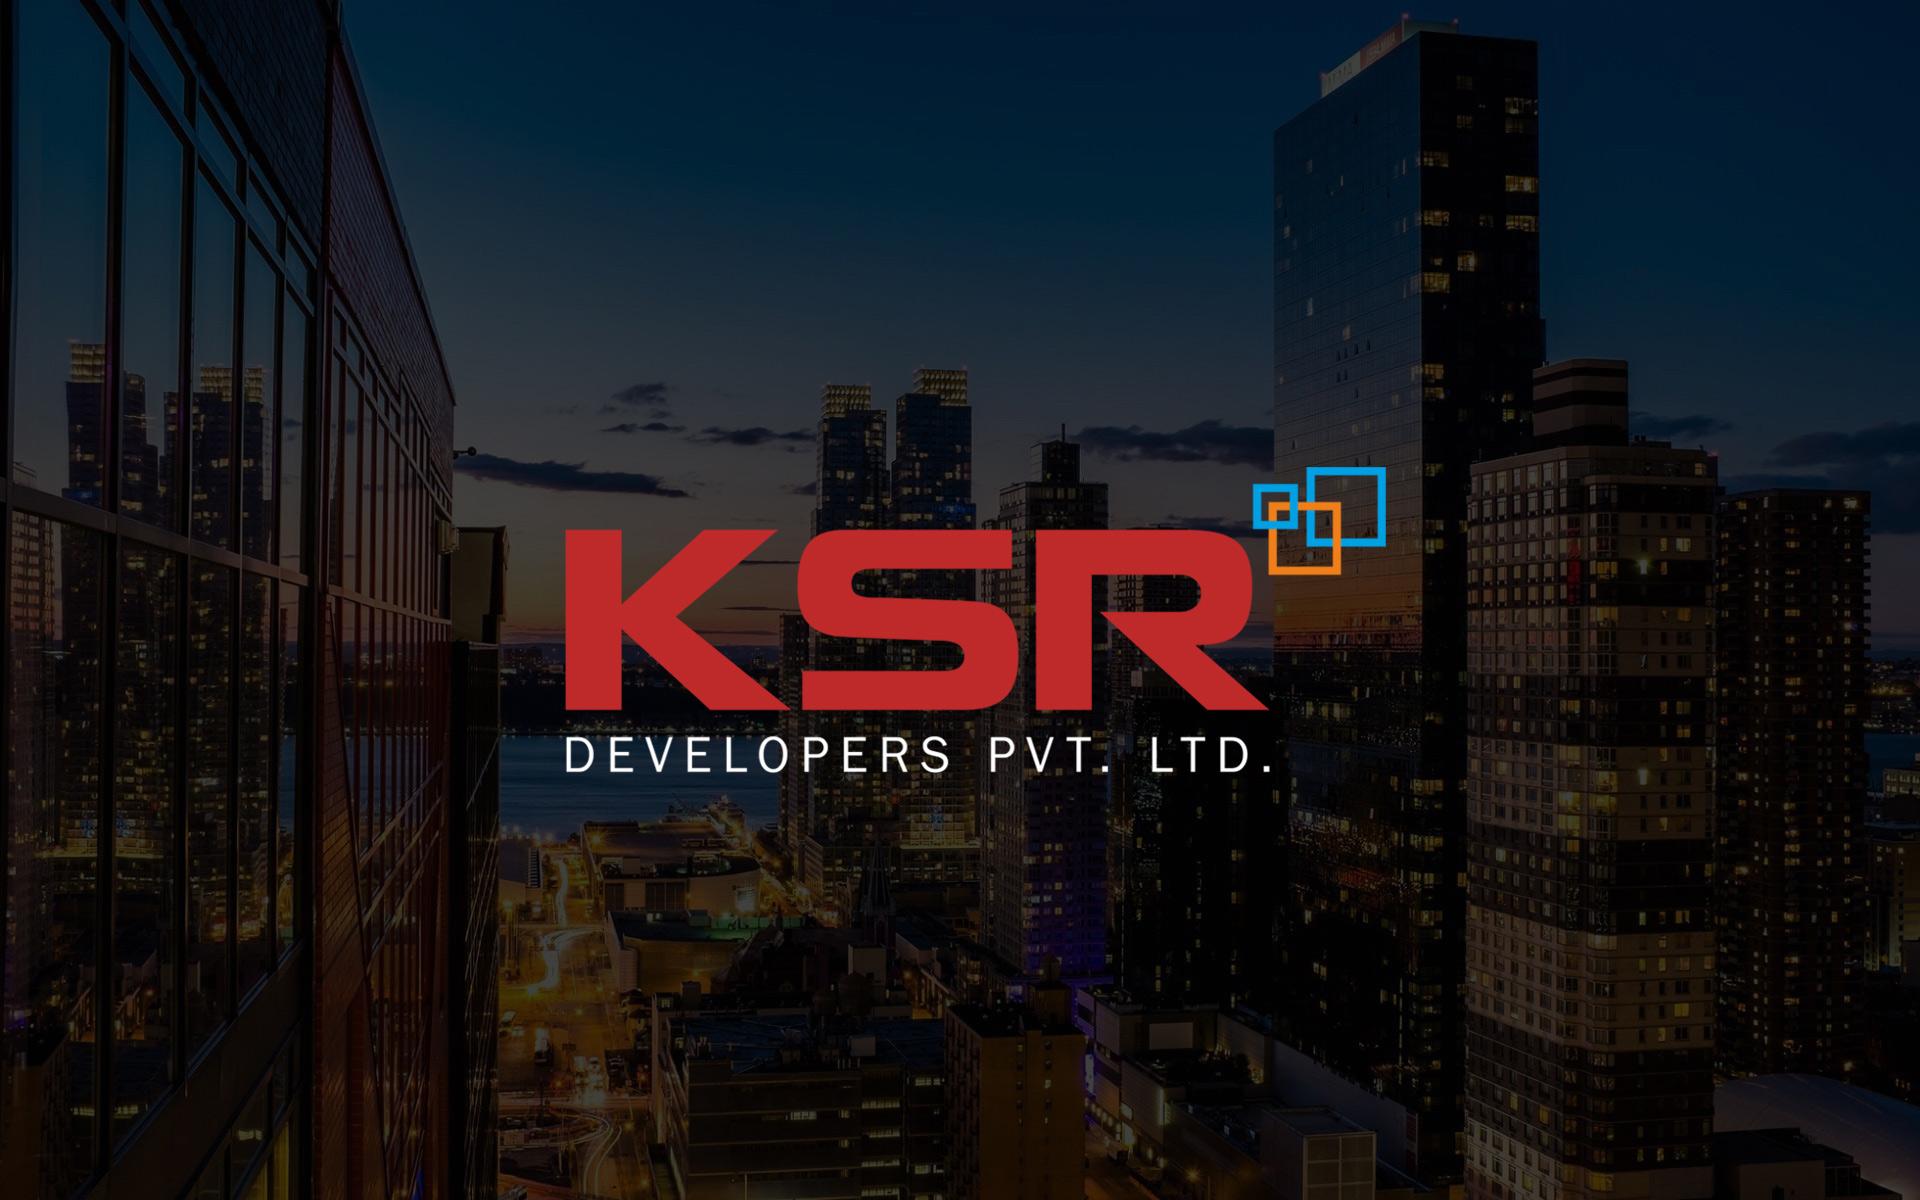 ksr-developers-construction-company-logo-branding-hyderabad